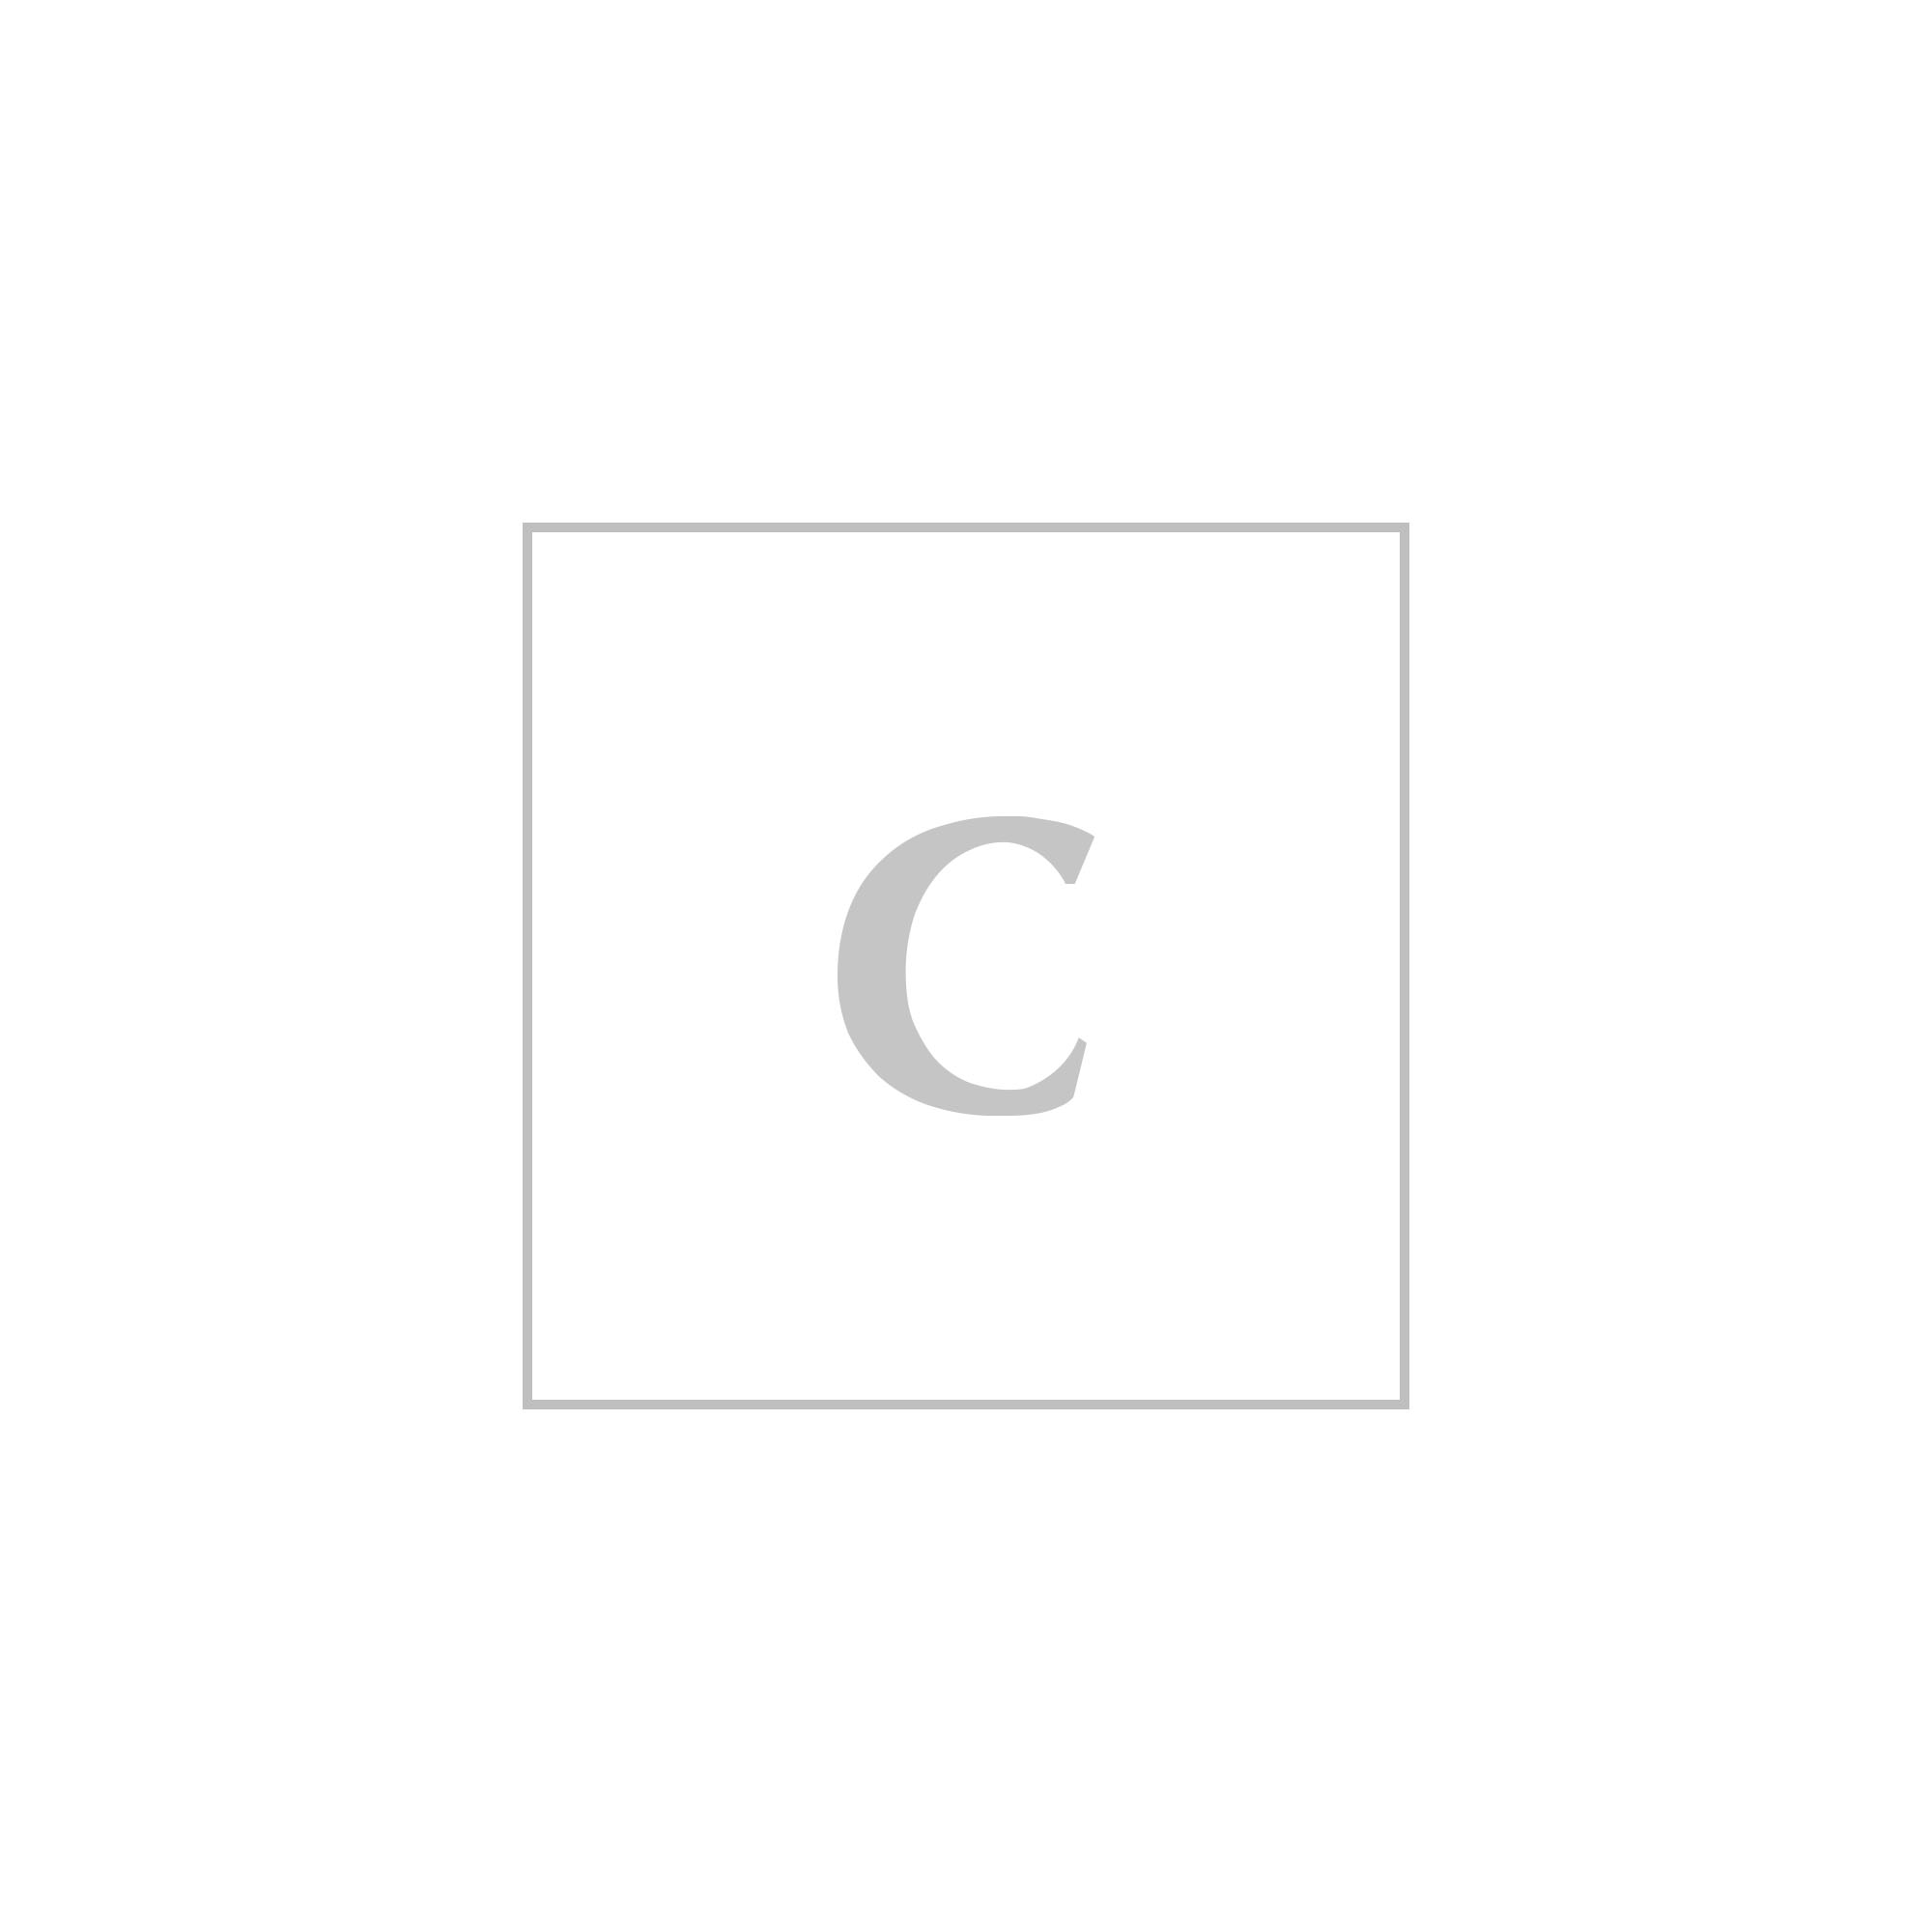 Michael kors mini borsa cindy dome crossbody